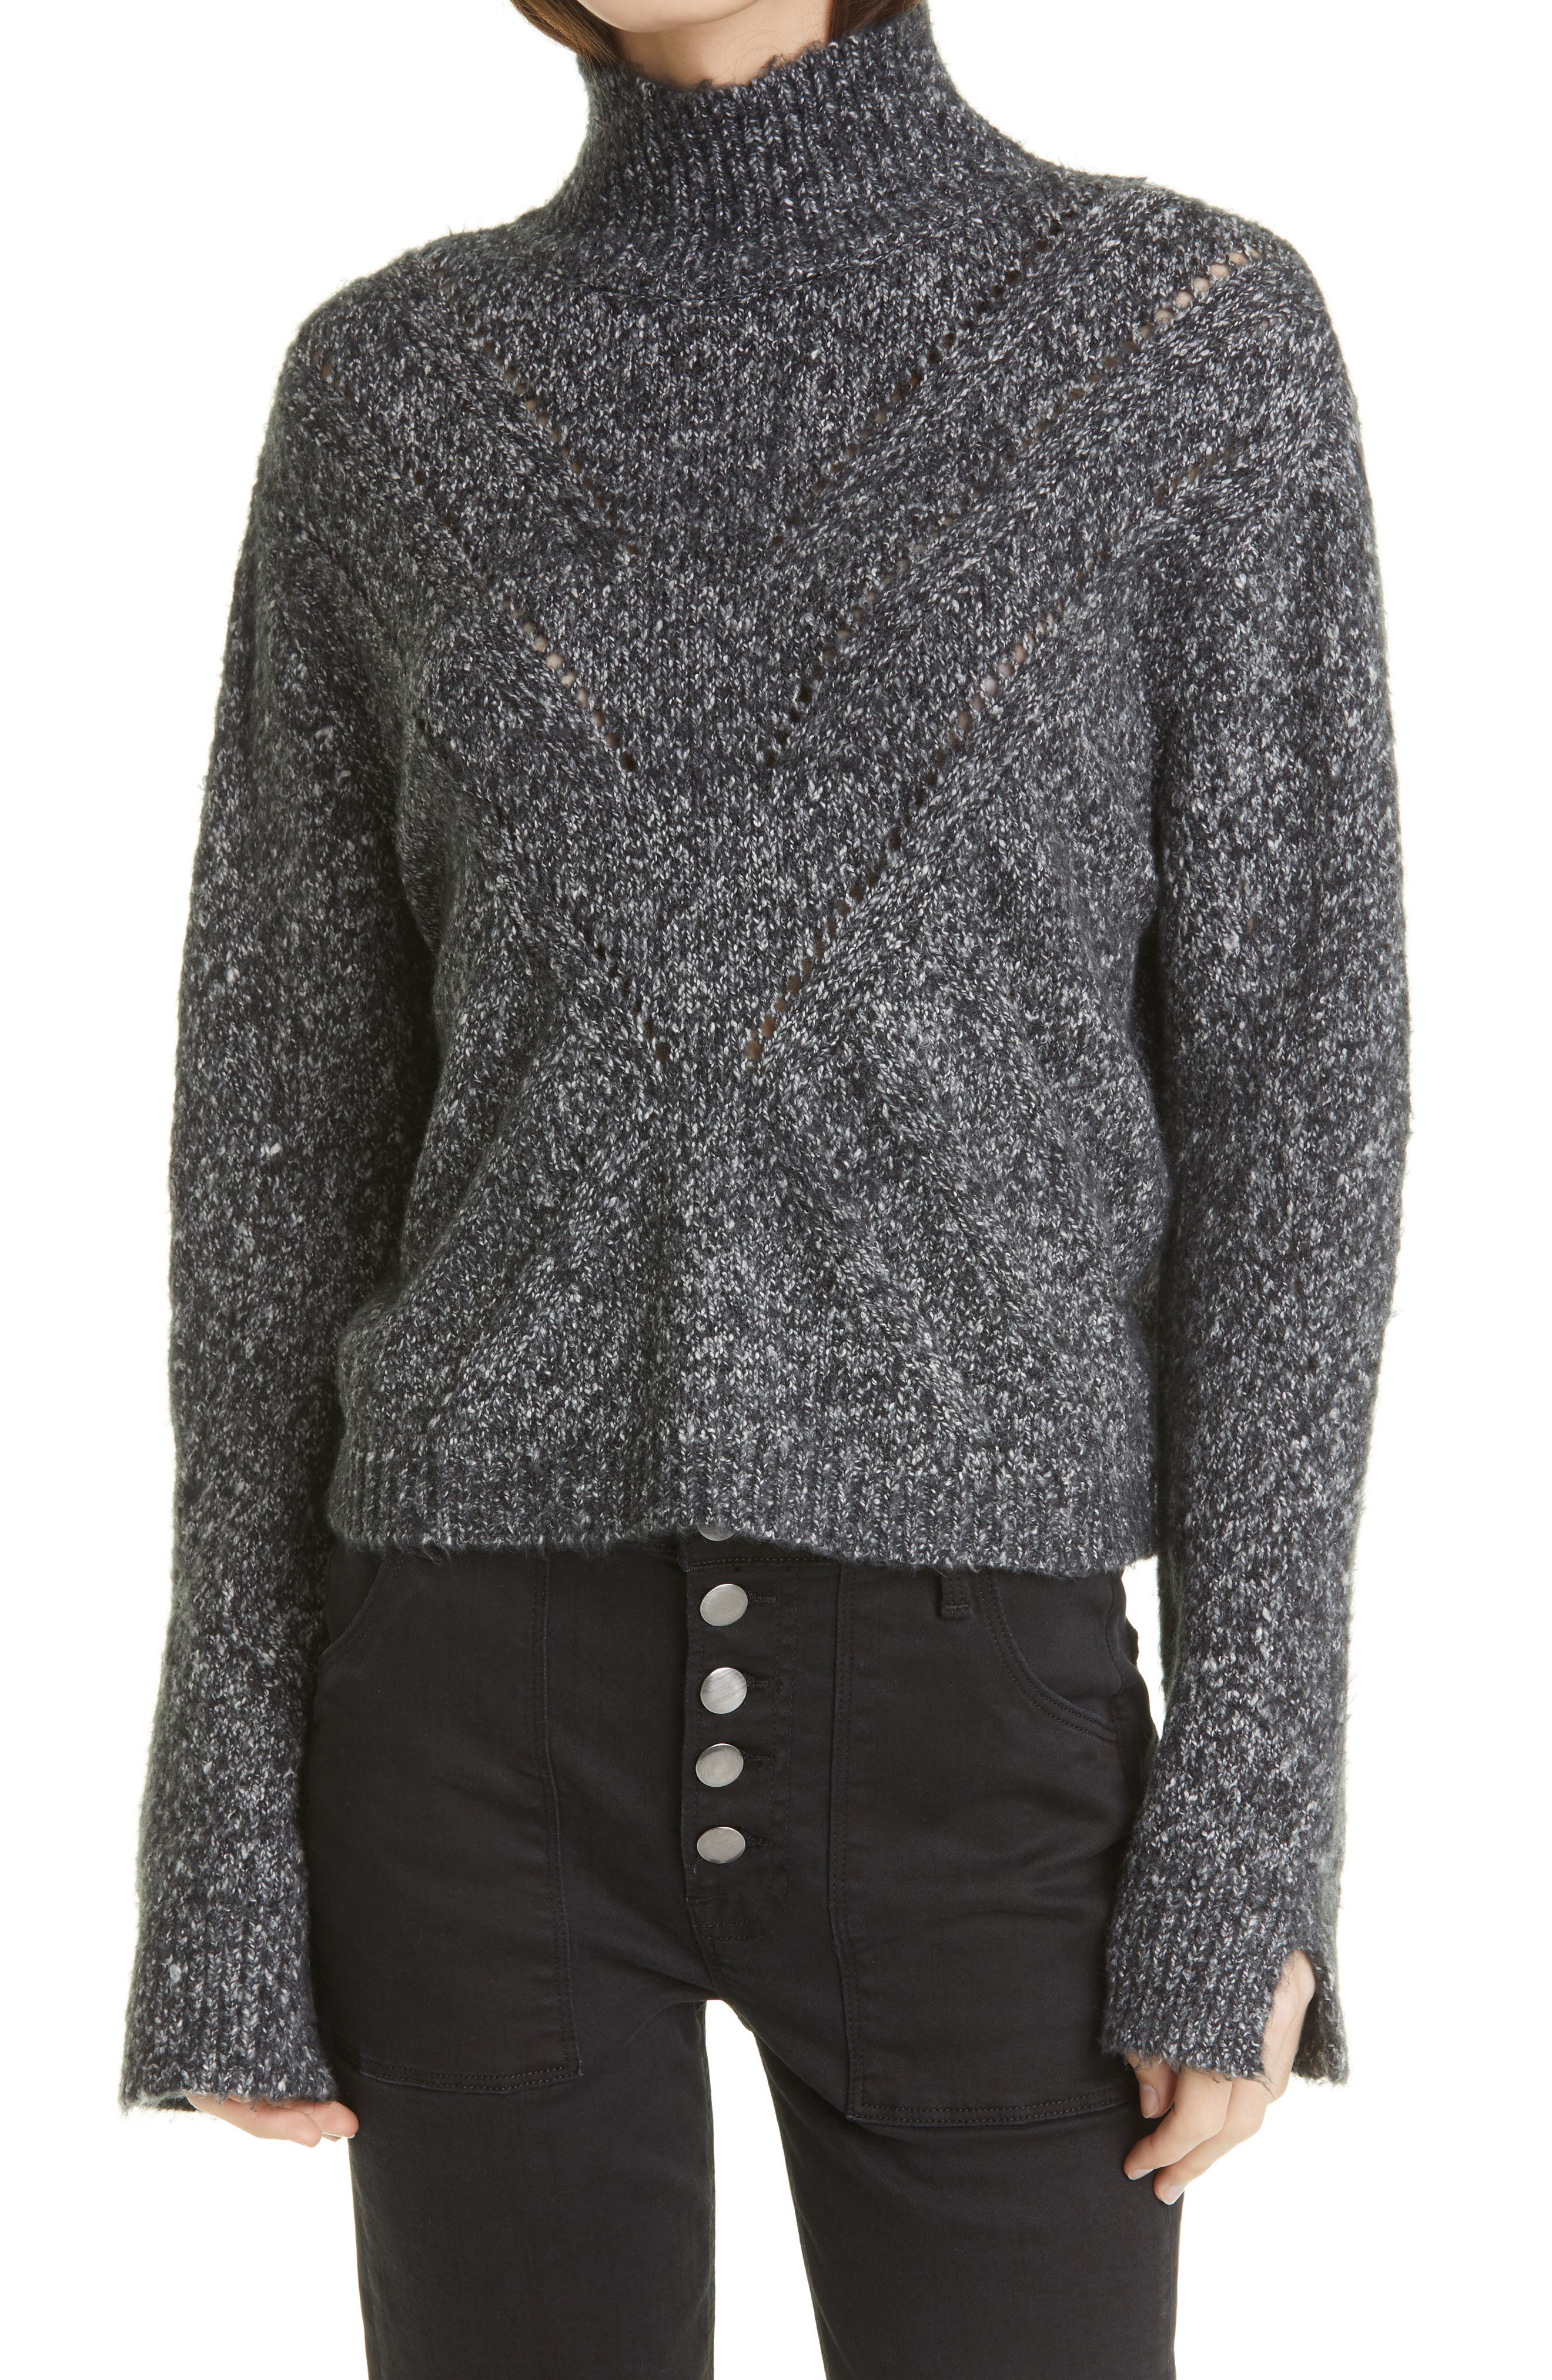 Tina Stitch Turtleneck Sweater